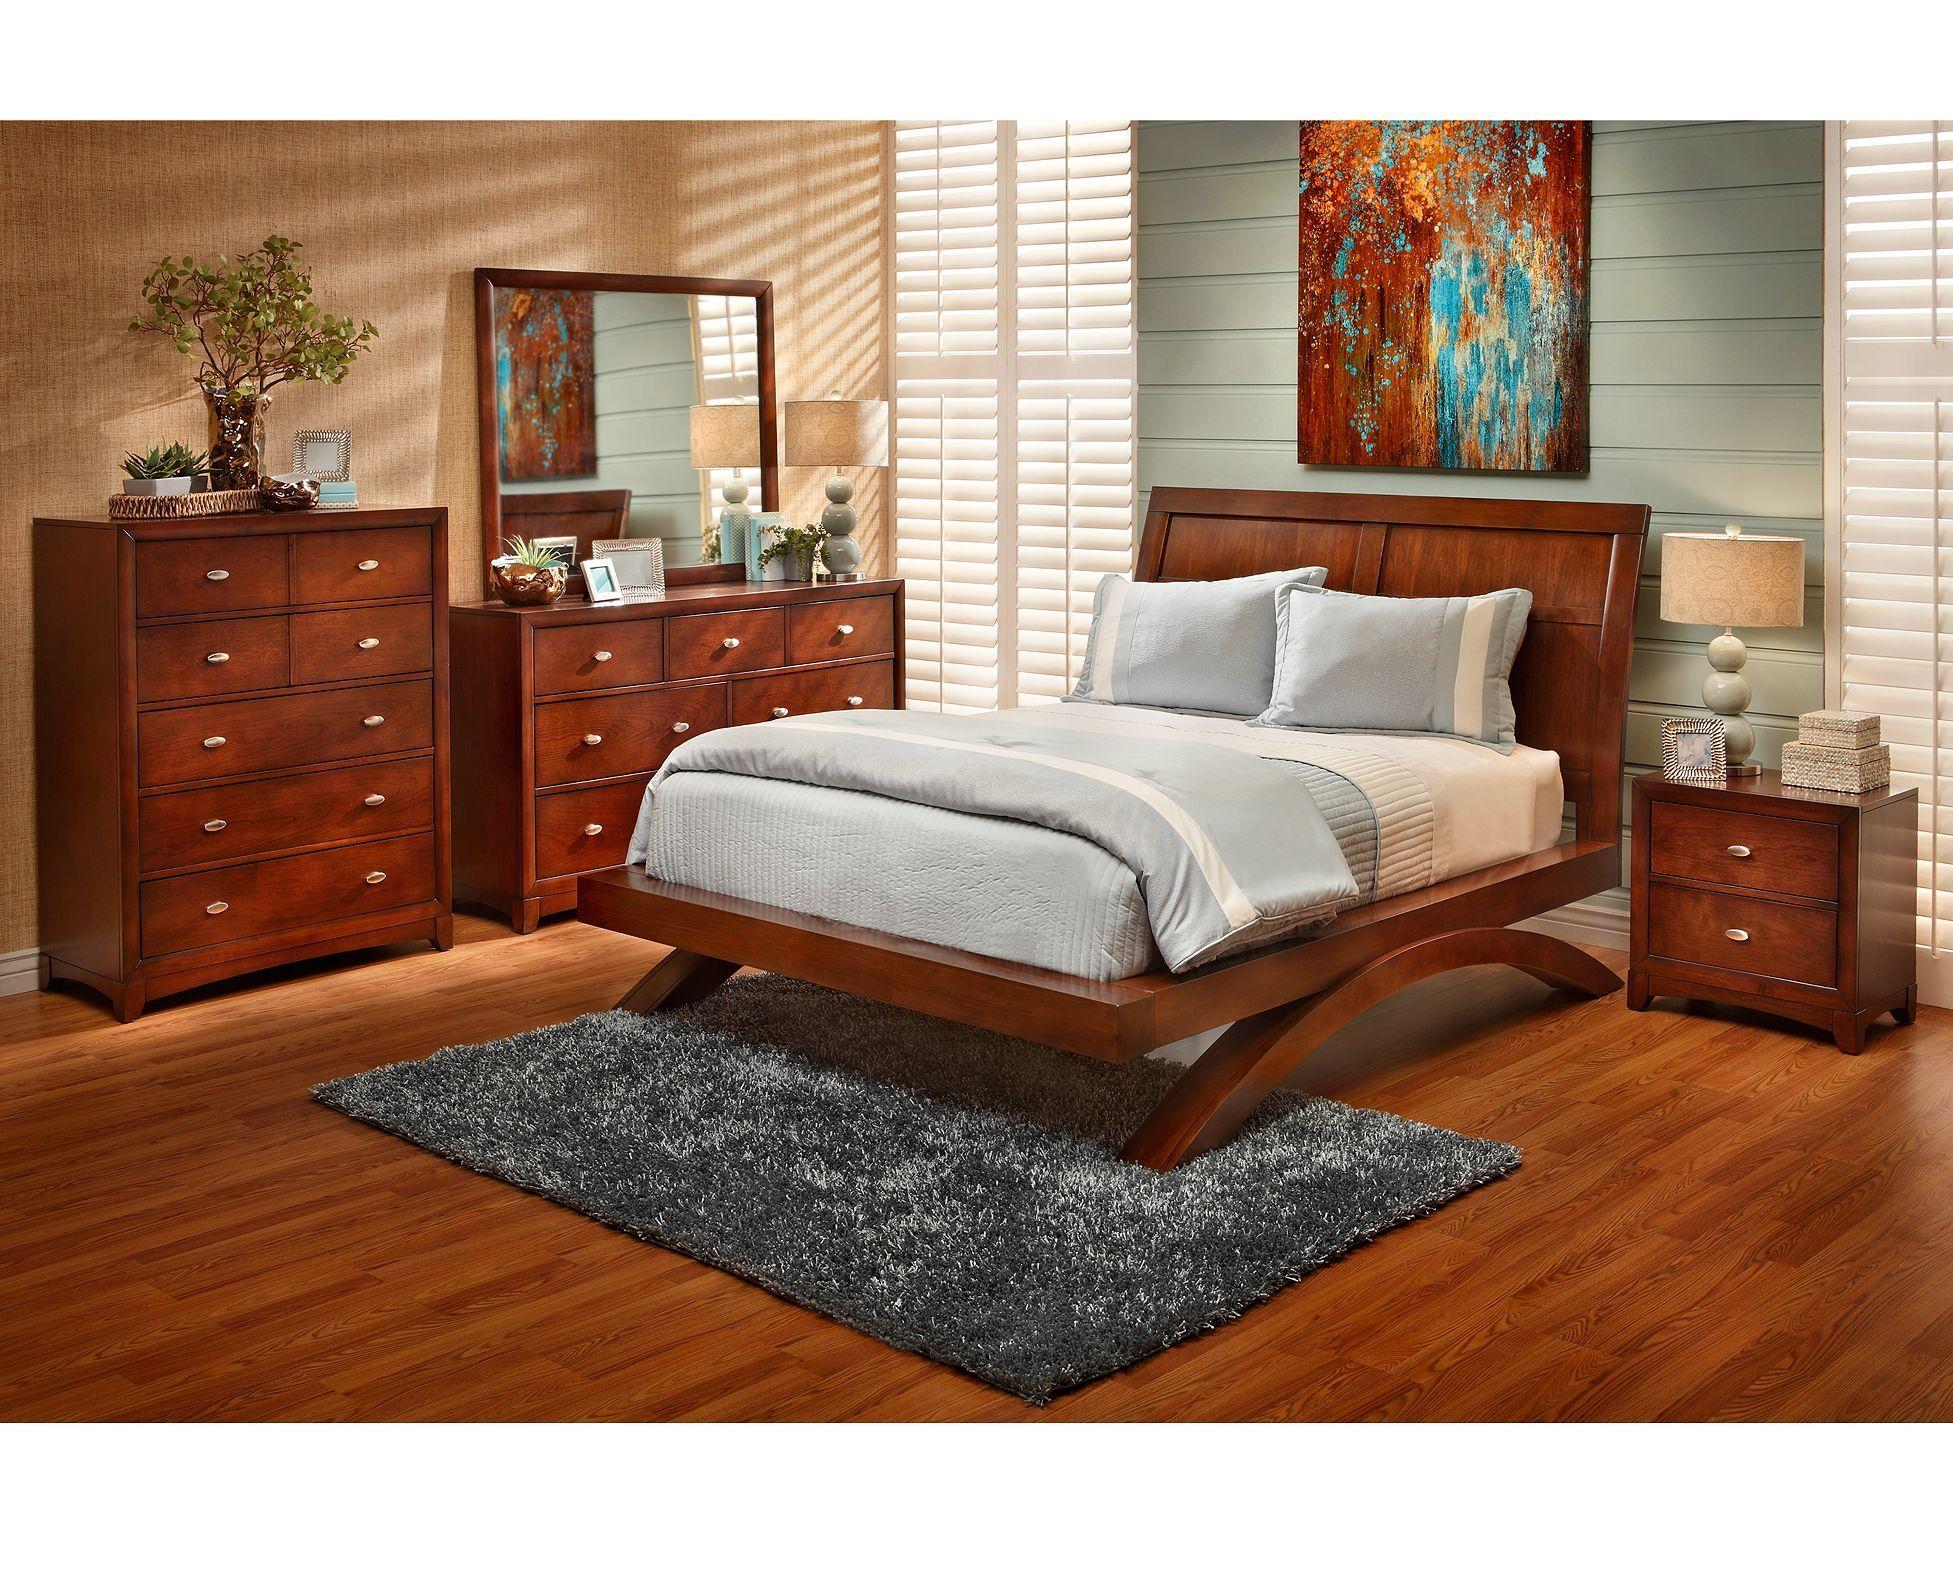 Grant Park Platform Bed (With images) Full bedroom